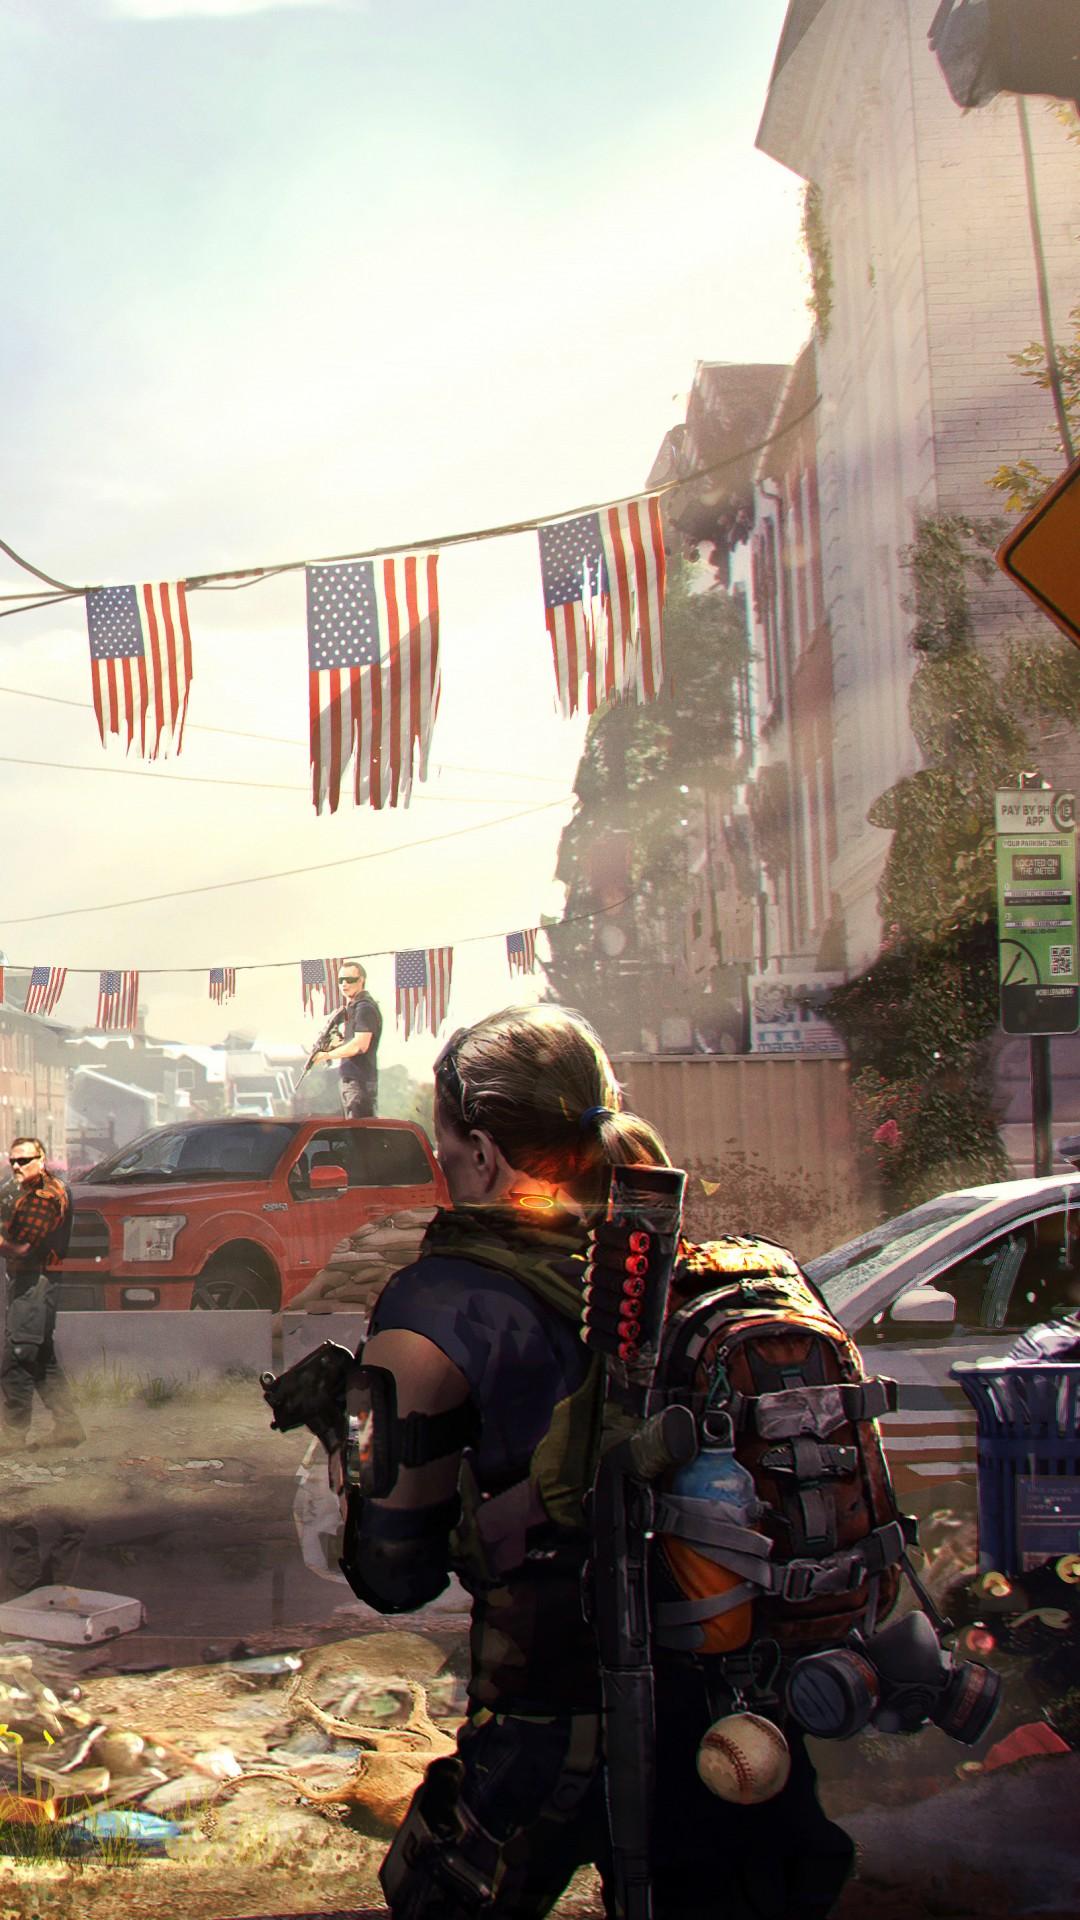 3840x2160 Wallpaper Cars Wallpaper Tom Clancy S The Division 2 E3 2018 Artwork